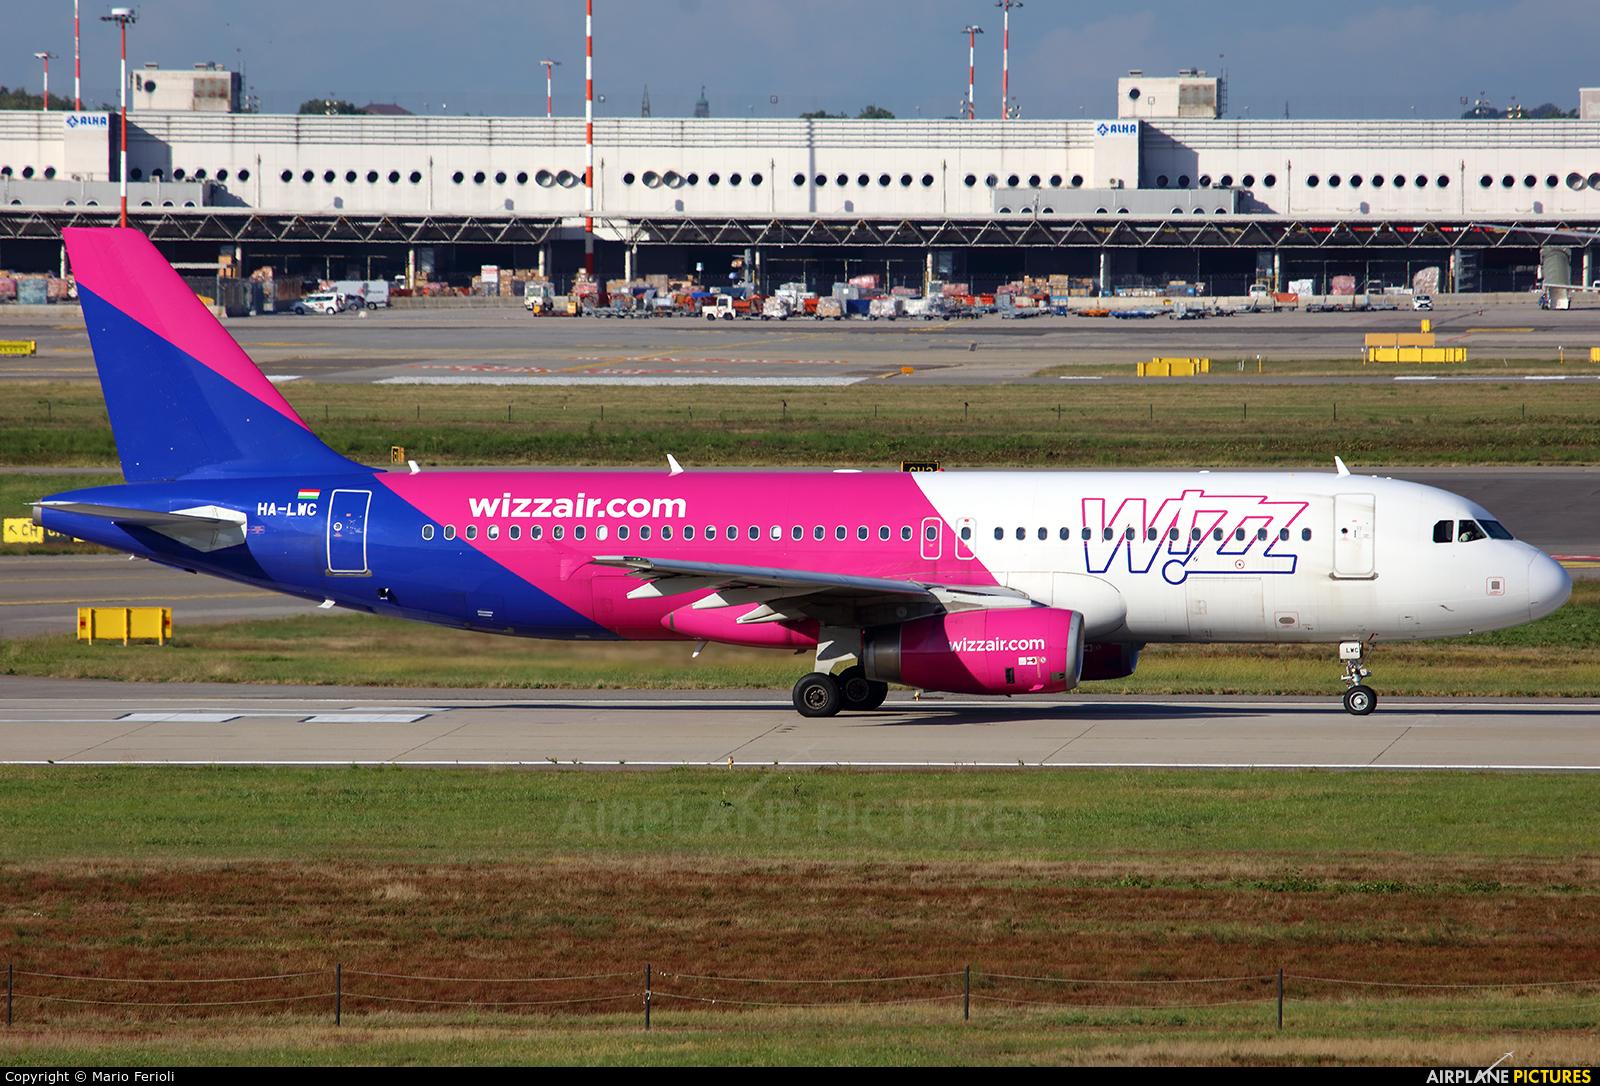 Wizz Air HA-LWC aircraft at Milan - Malpensa